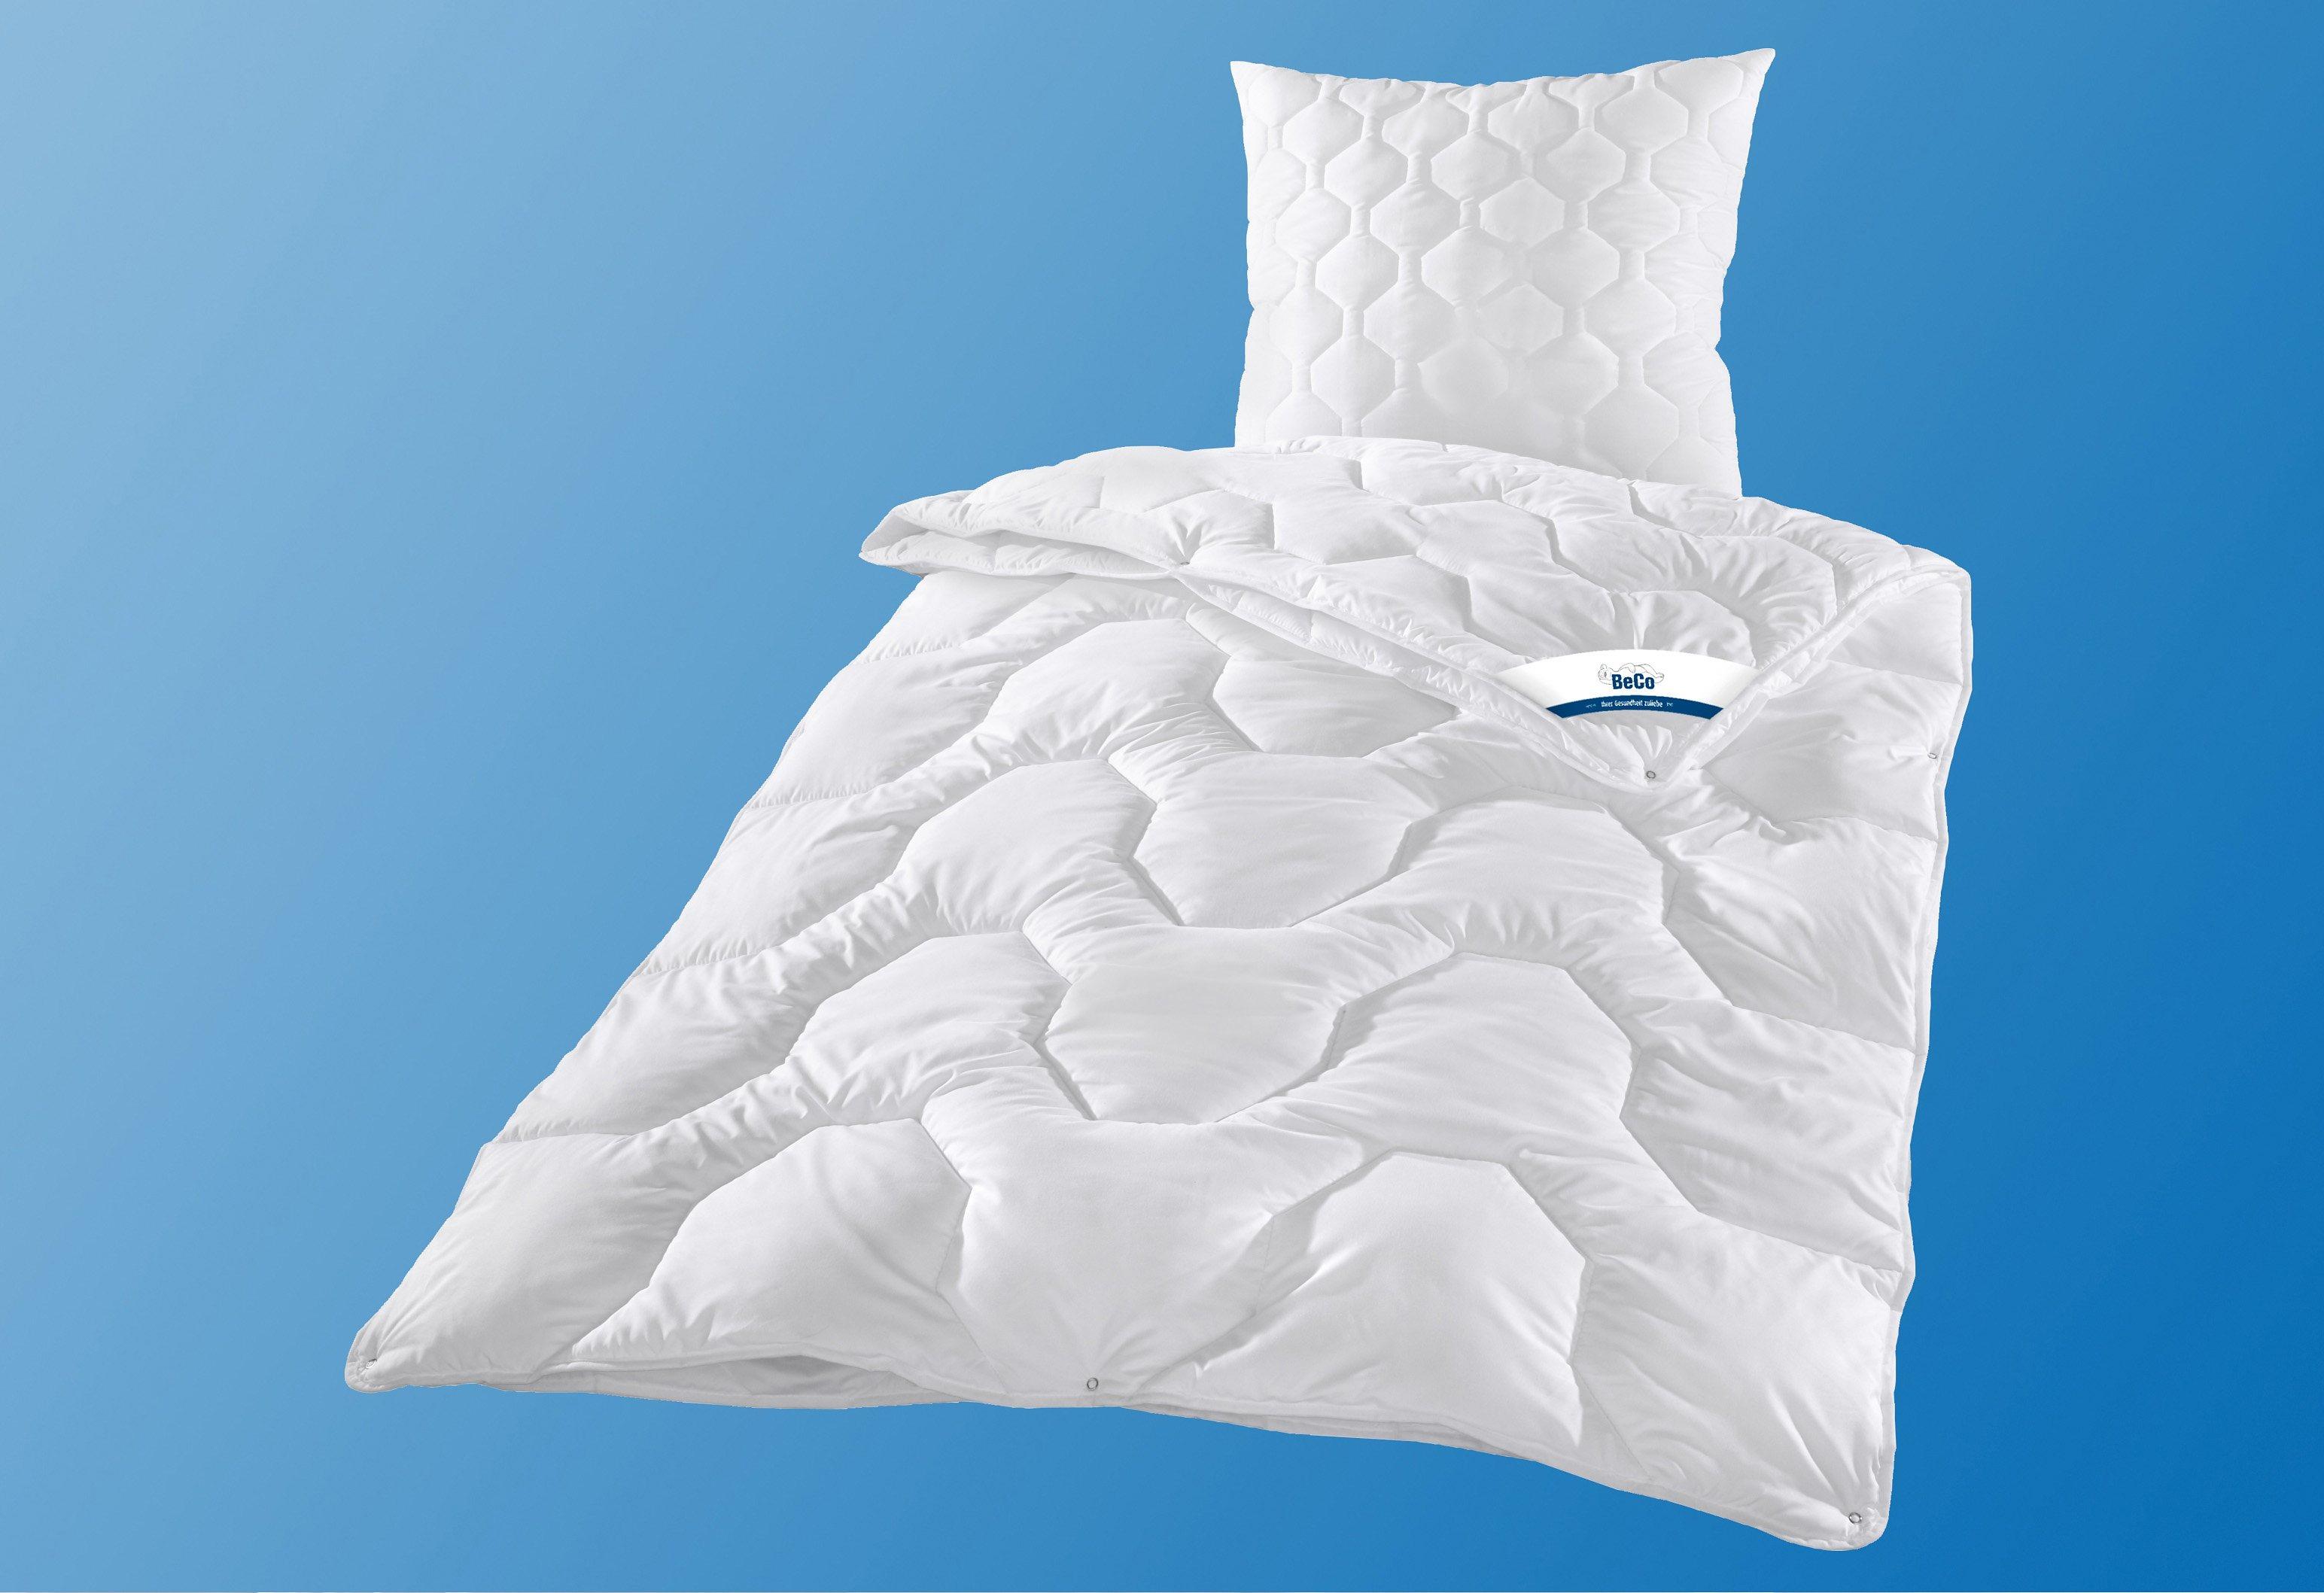 Bettdeckenset, »Cotton 95«, BeCo, 4-Jahreszeiten, Leichtdecke gratis, kochfest | Heimtextilien > Decken und Kissen > Bettdecken | Beco